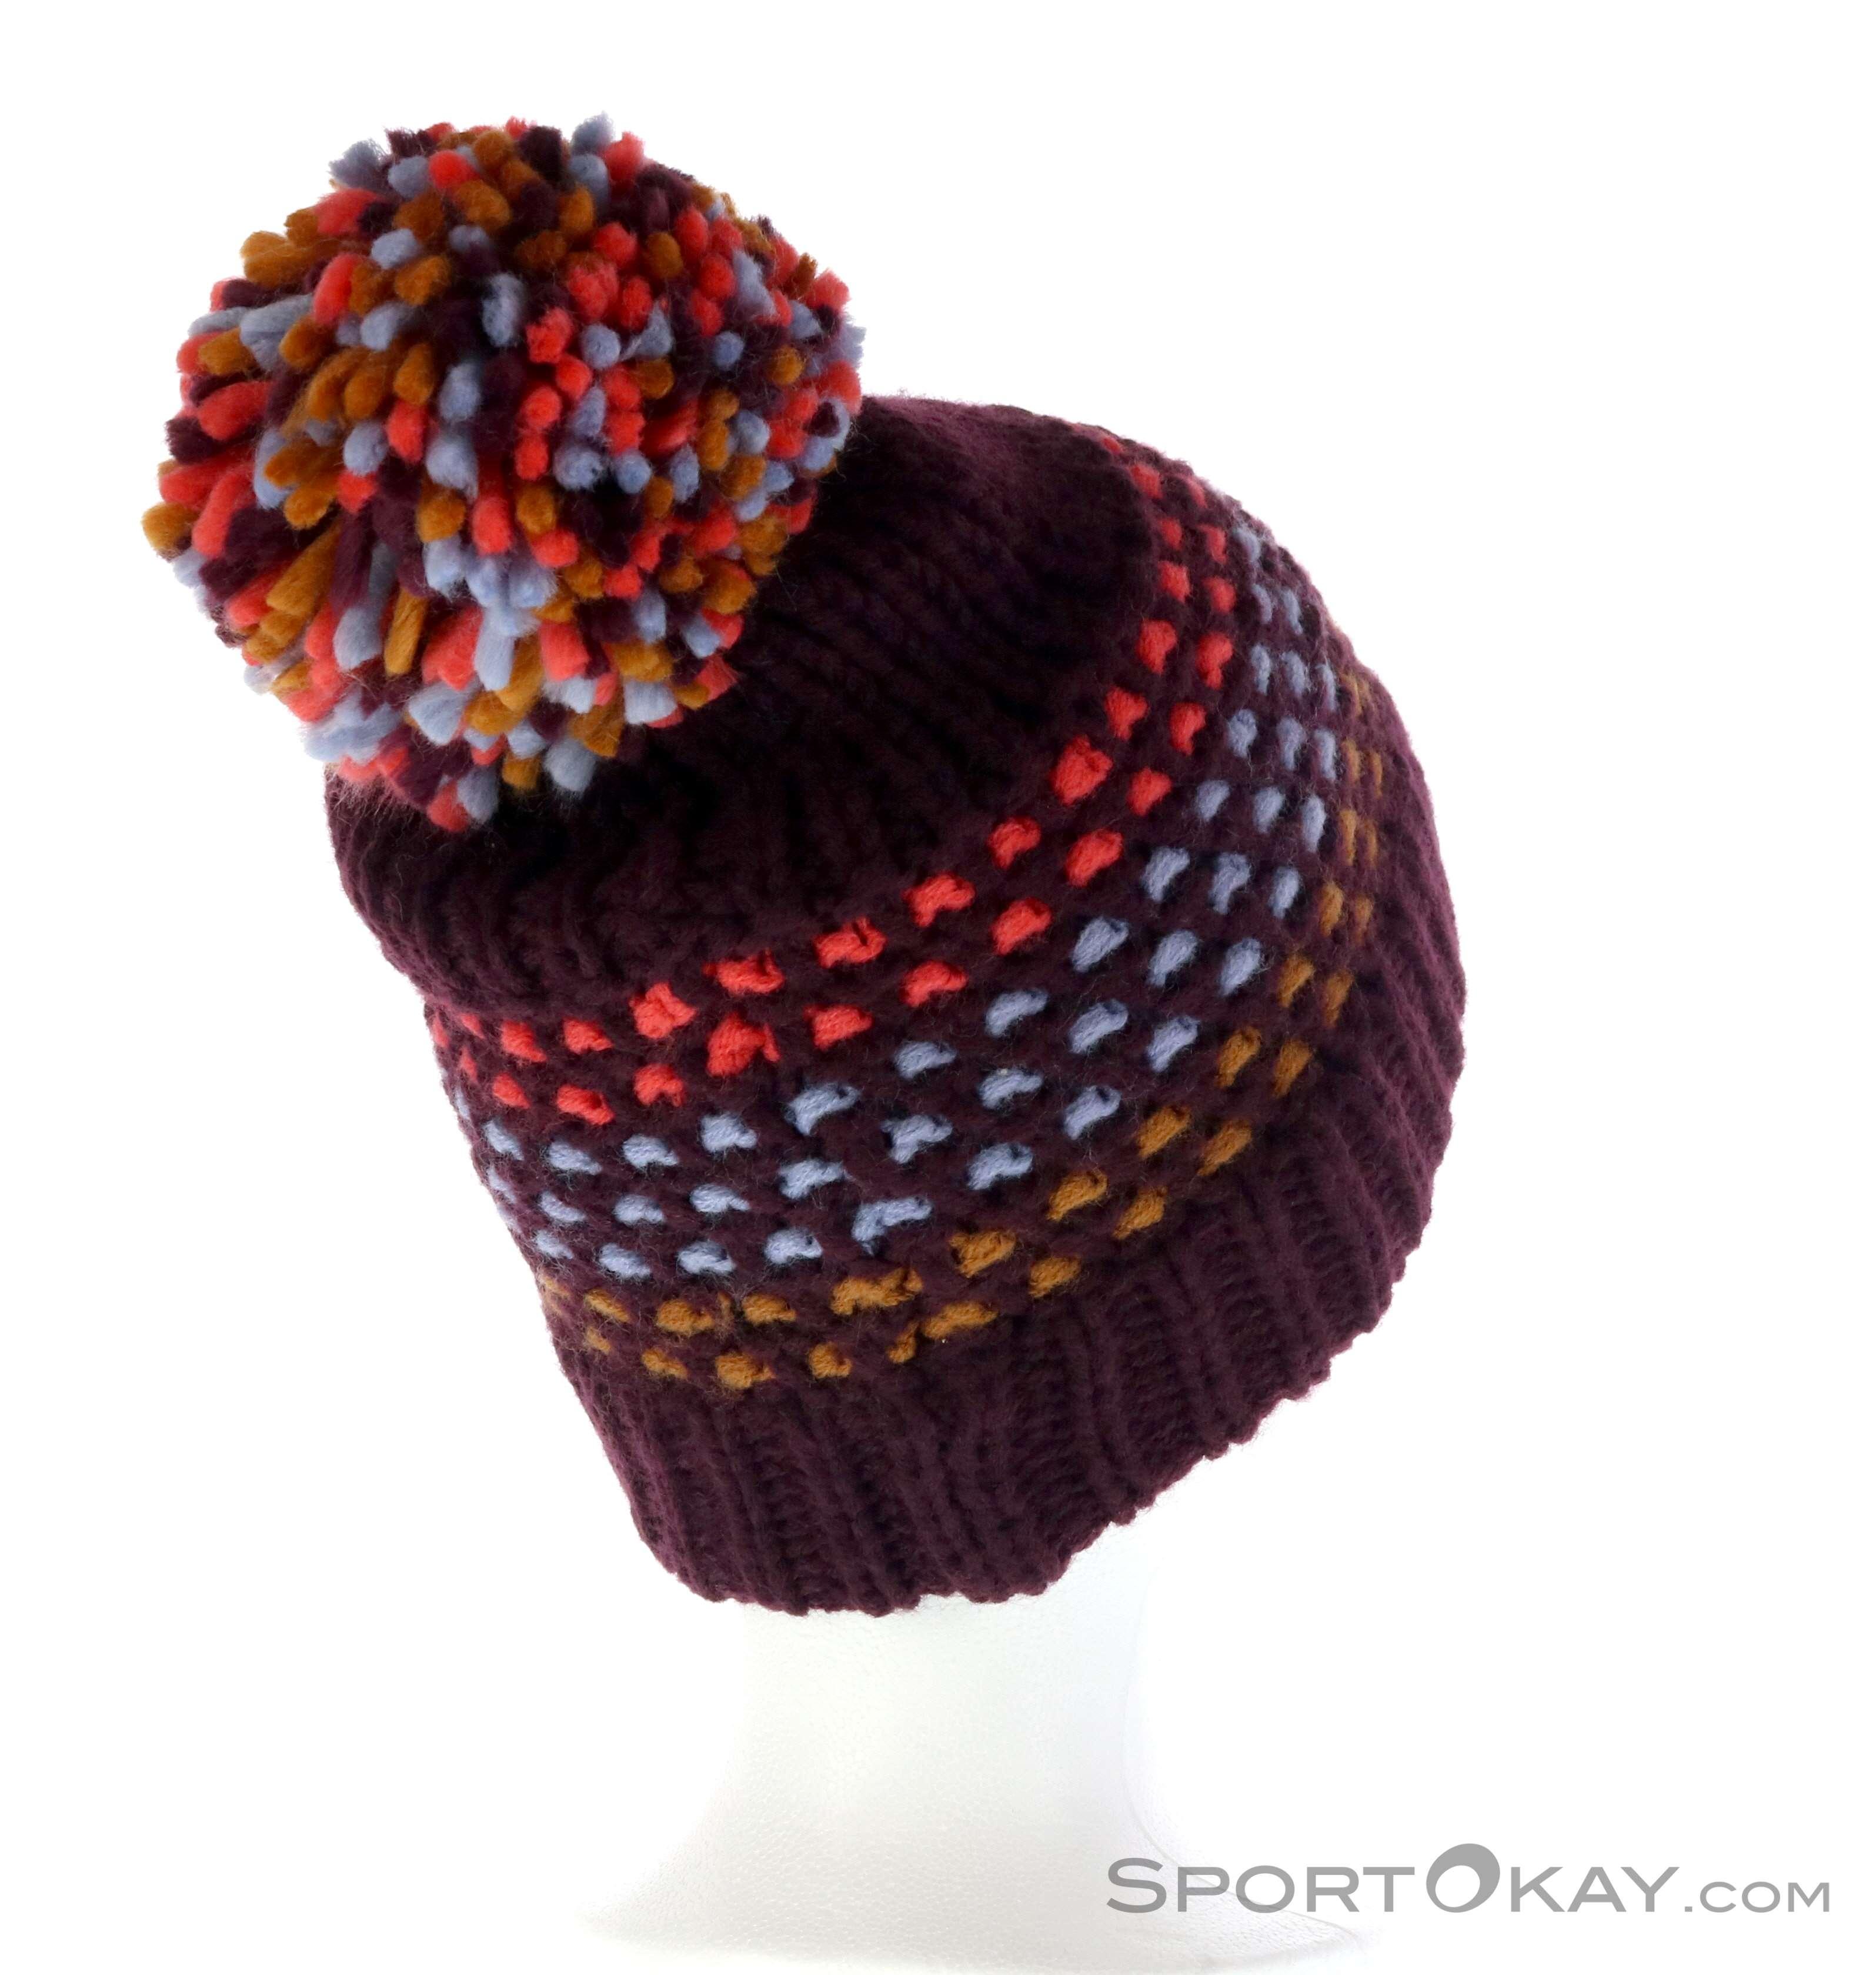 ca7c00866d0 Arcteryx Fernie Toque Womens Beanie - Caps   Headbands - Outdoor ...